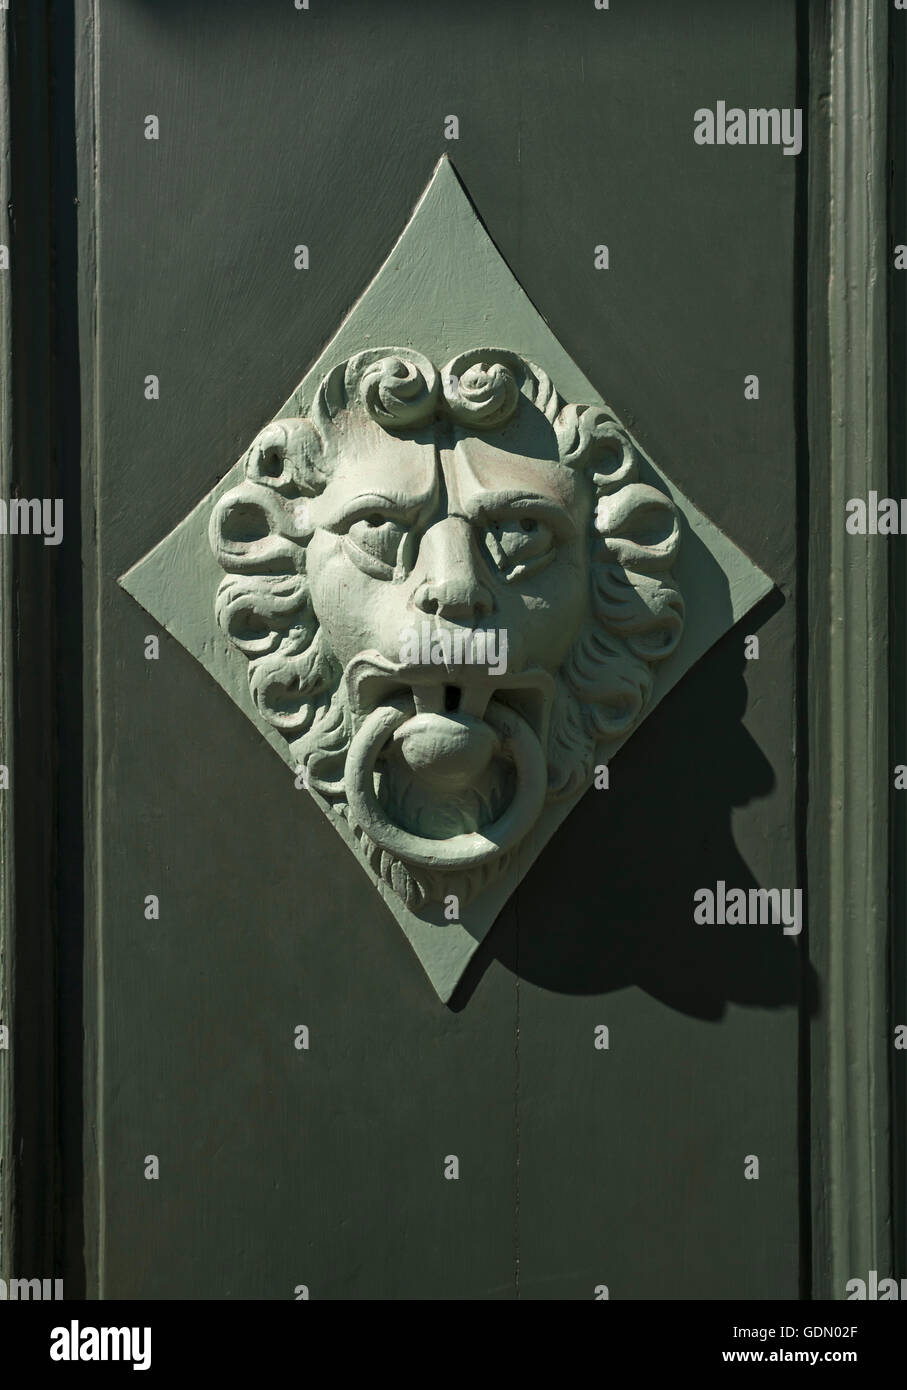 Lion head as a door knocker on a door, Wismar, Mecklenburg-Western Pomerania, Germany - Stock Image